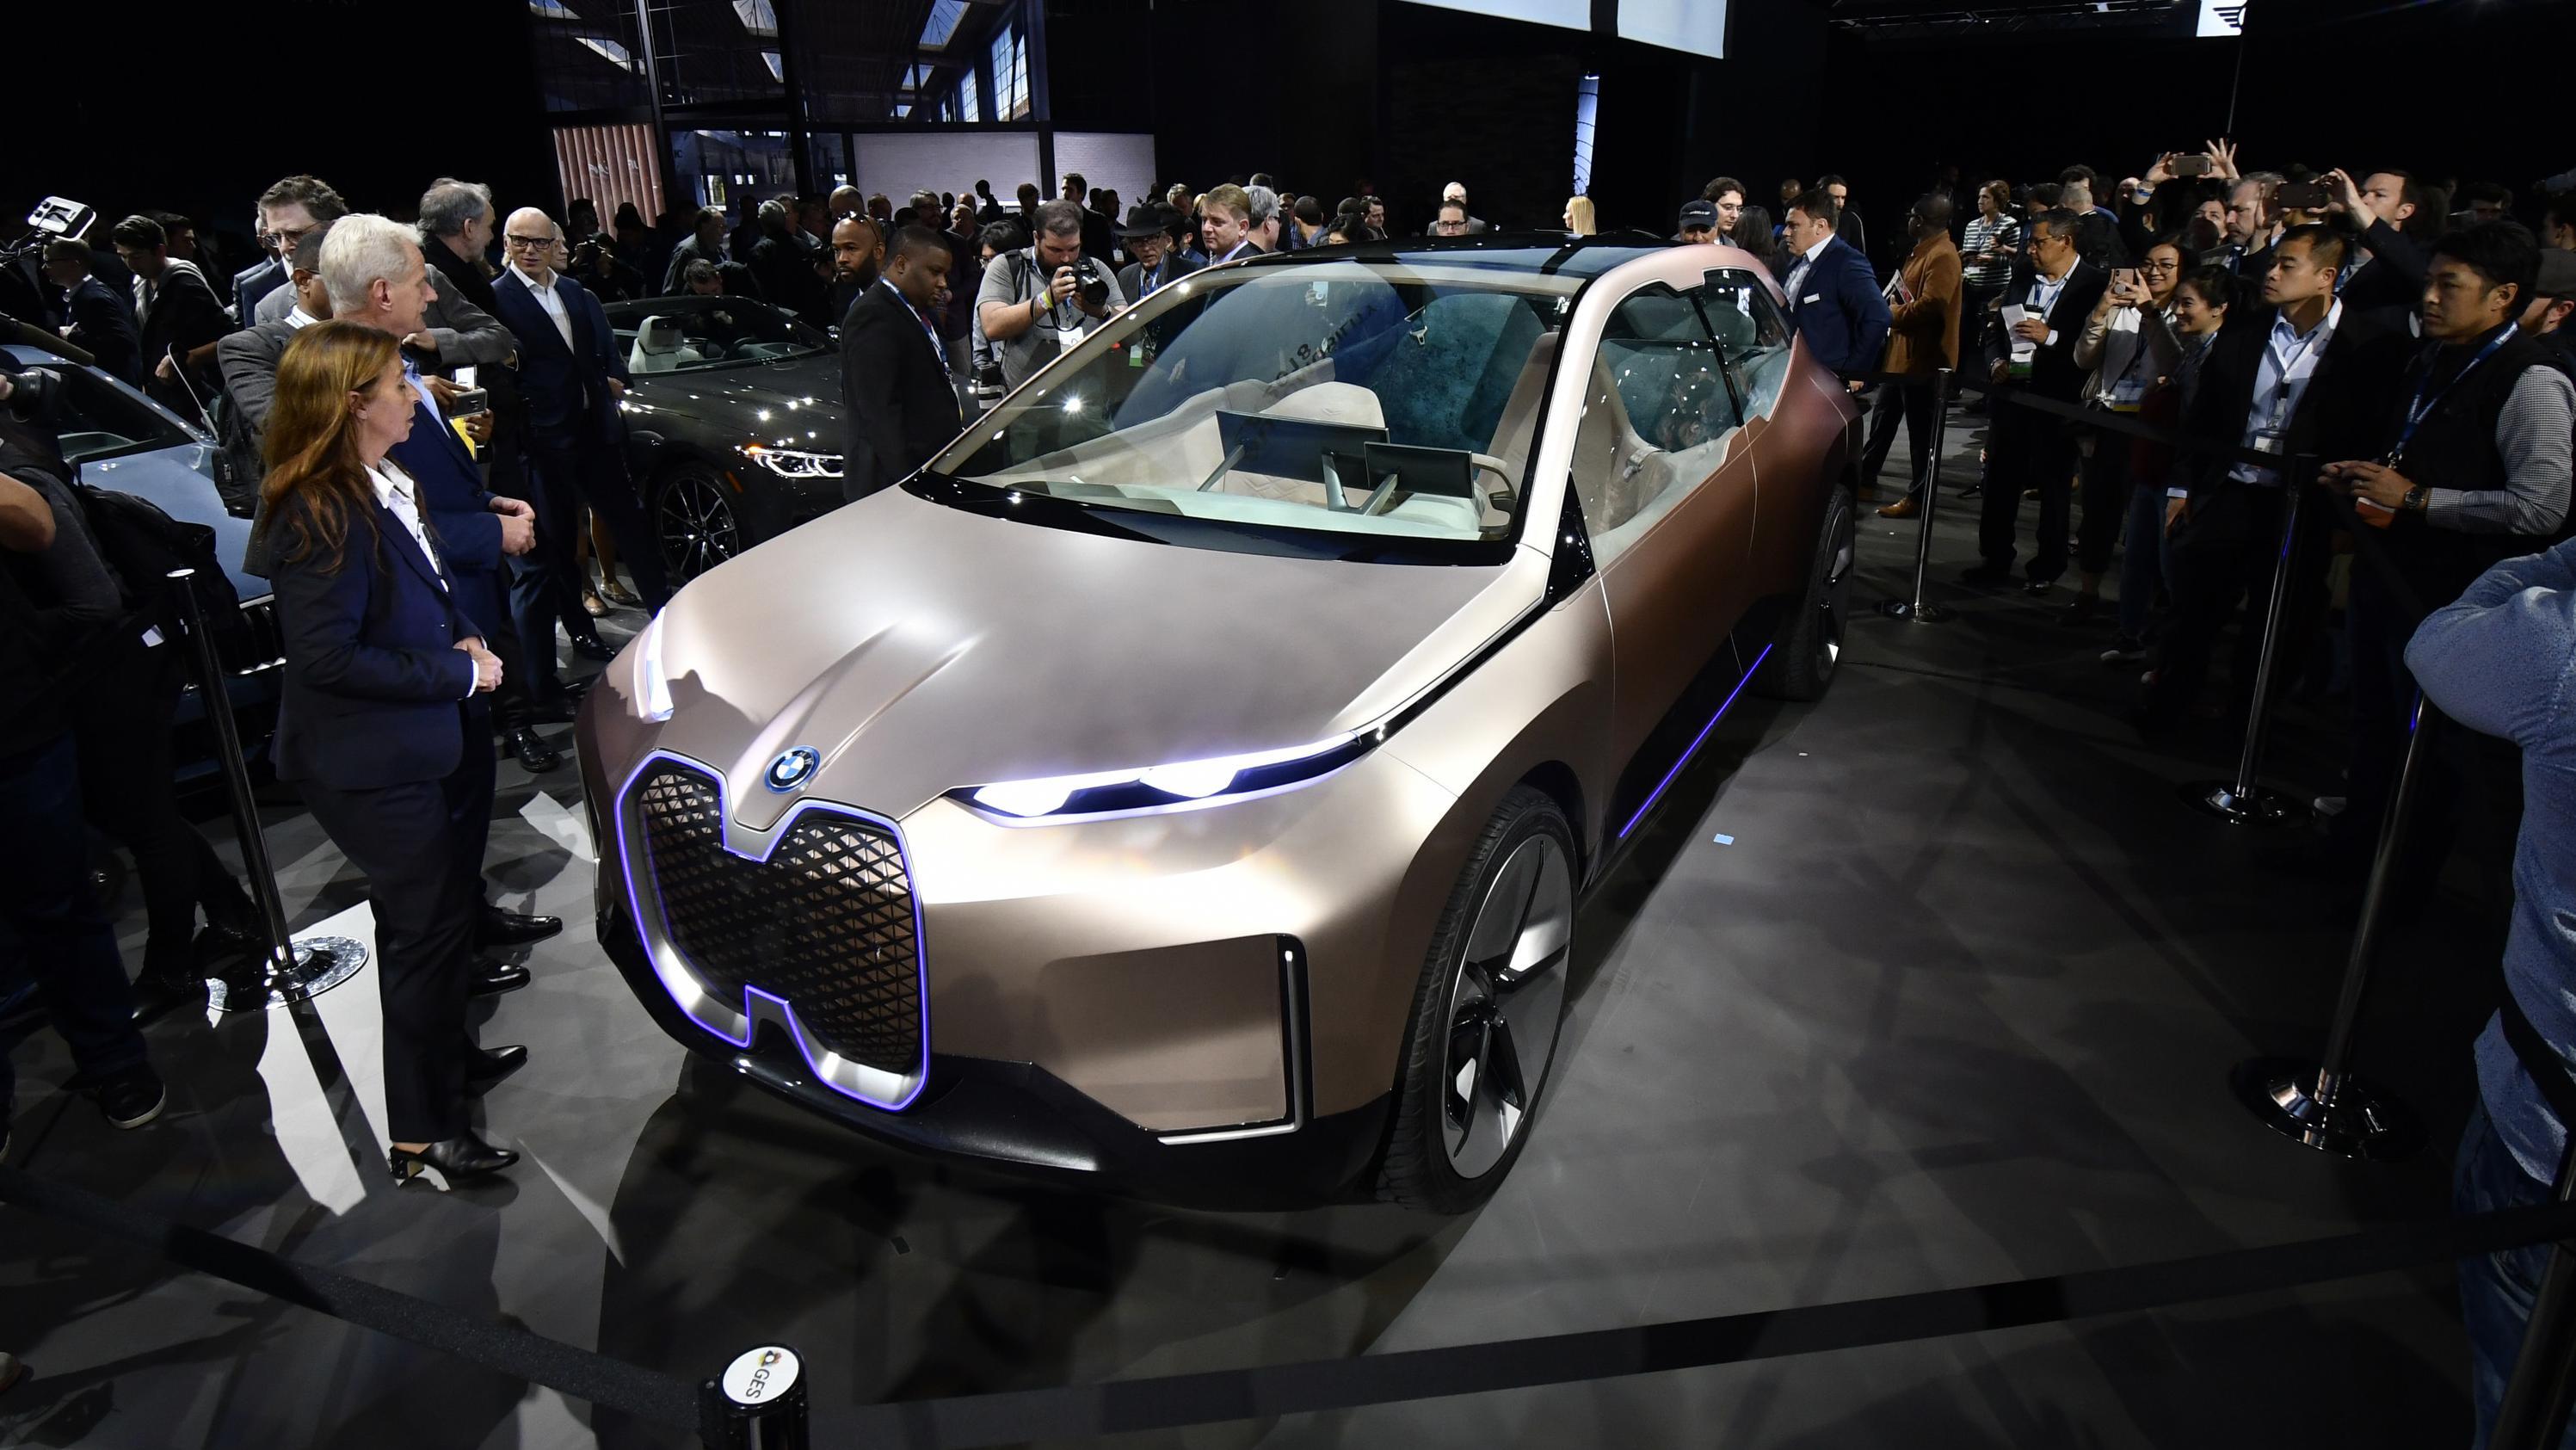 BMW Concept Car iNEXT auf der Los Angeles Auto Show 2018